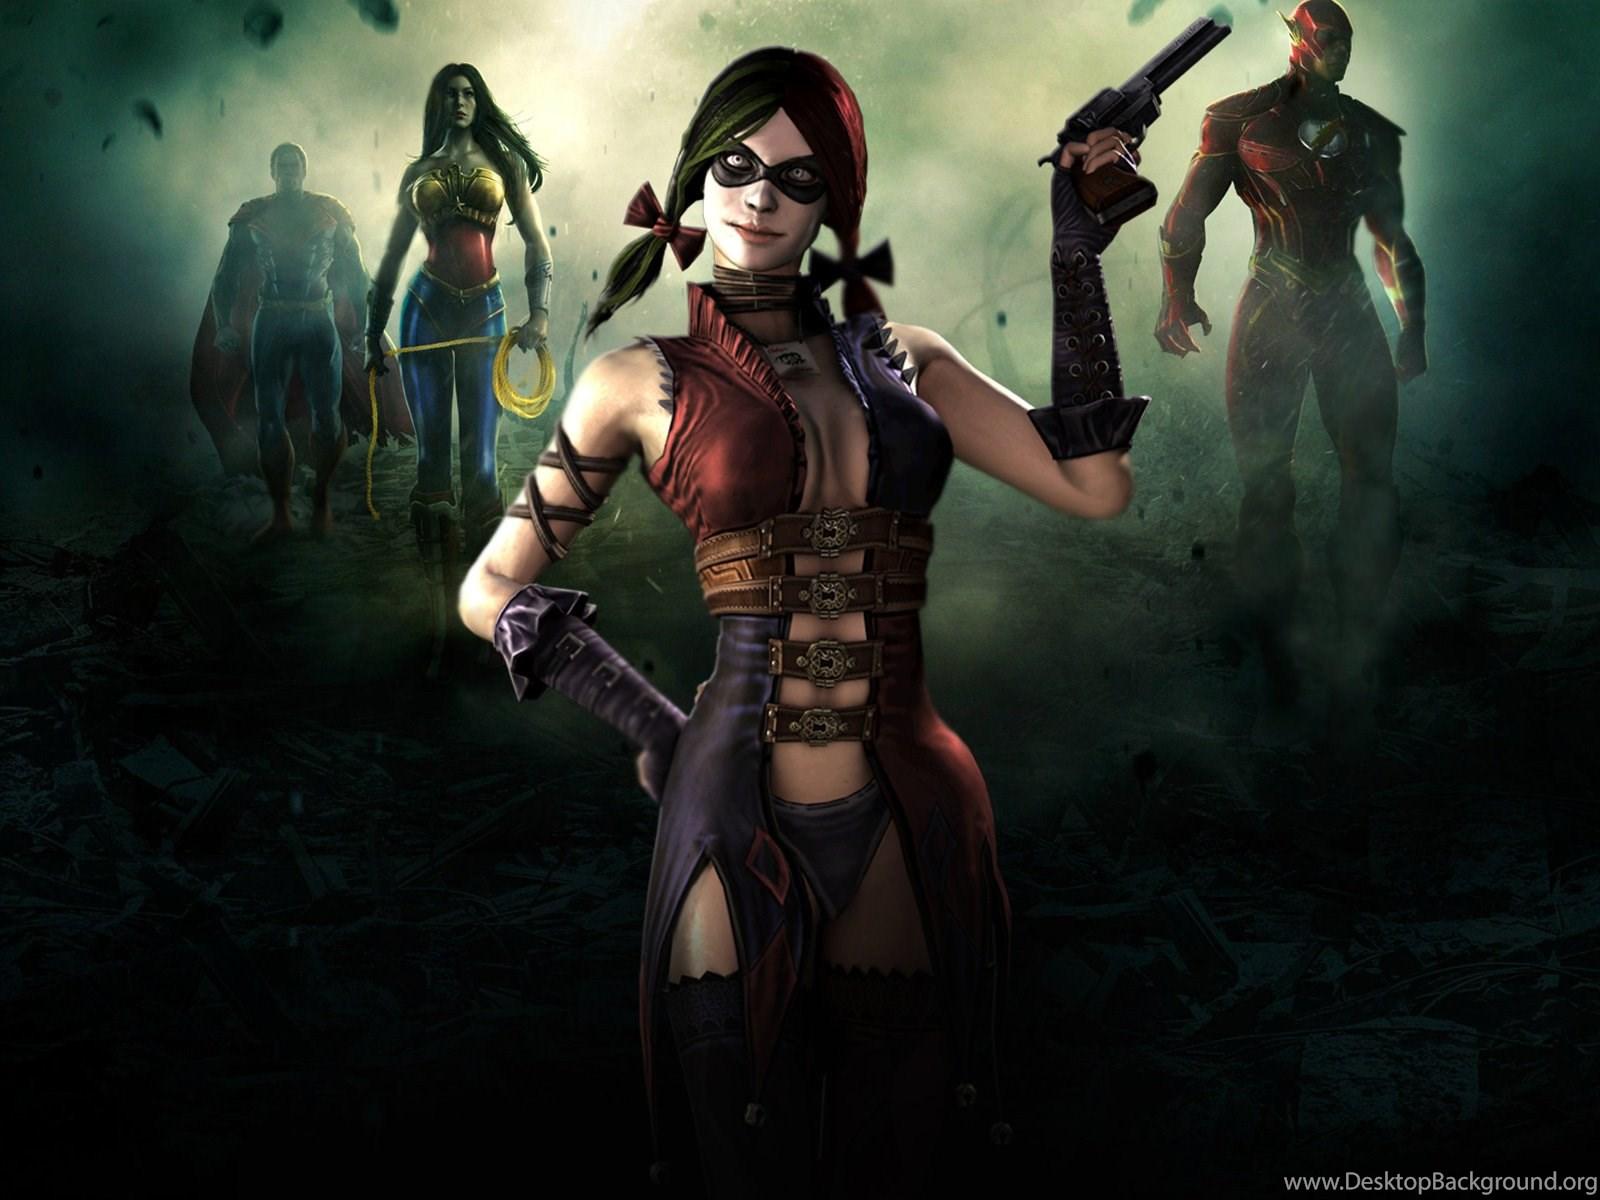 Free Harley Quinn Injustice Wallpapers 1080p Bc2 Wallx Desktop